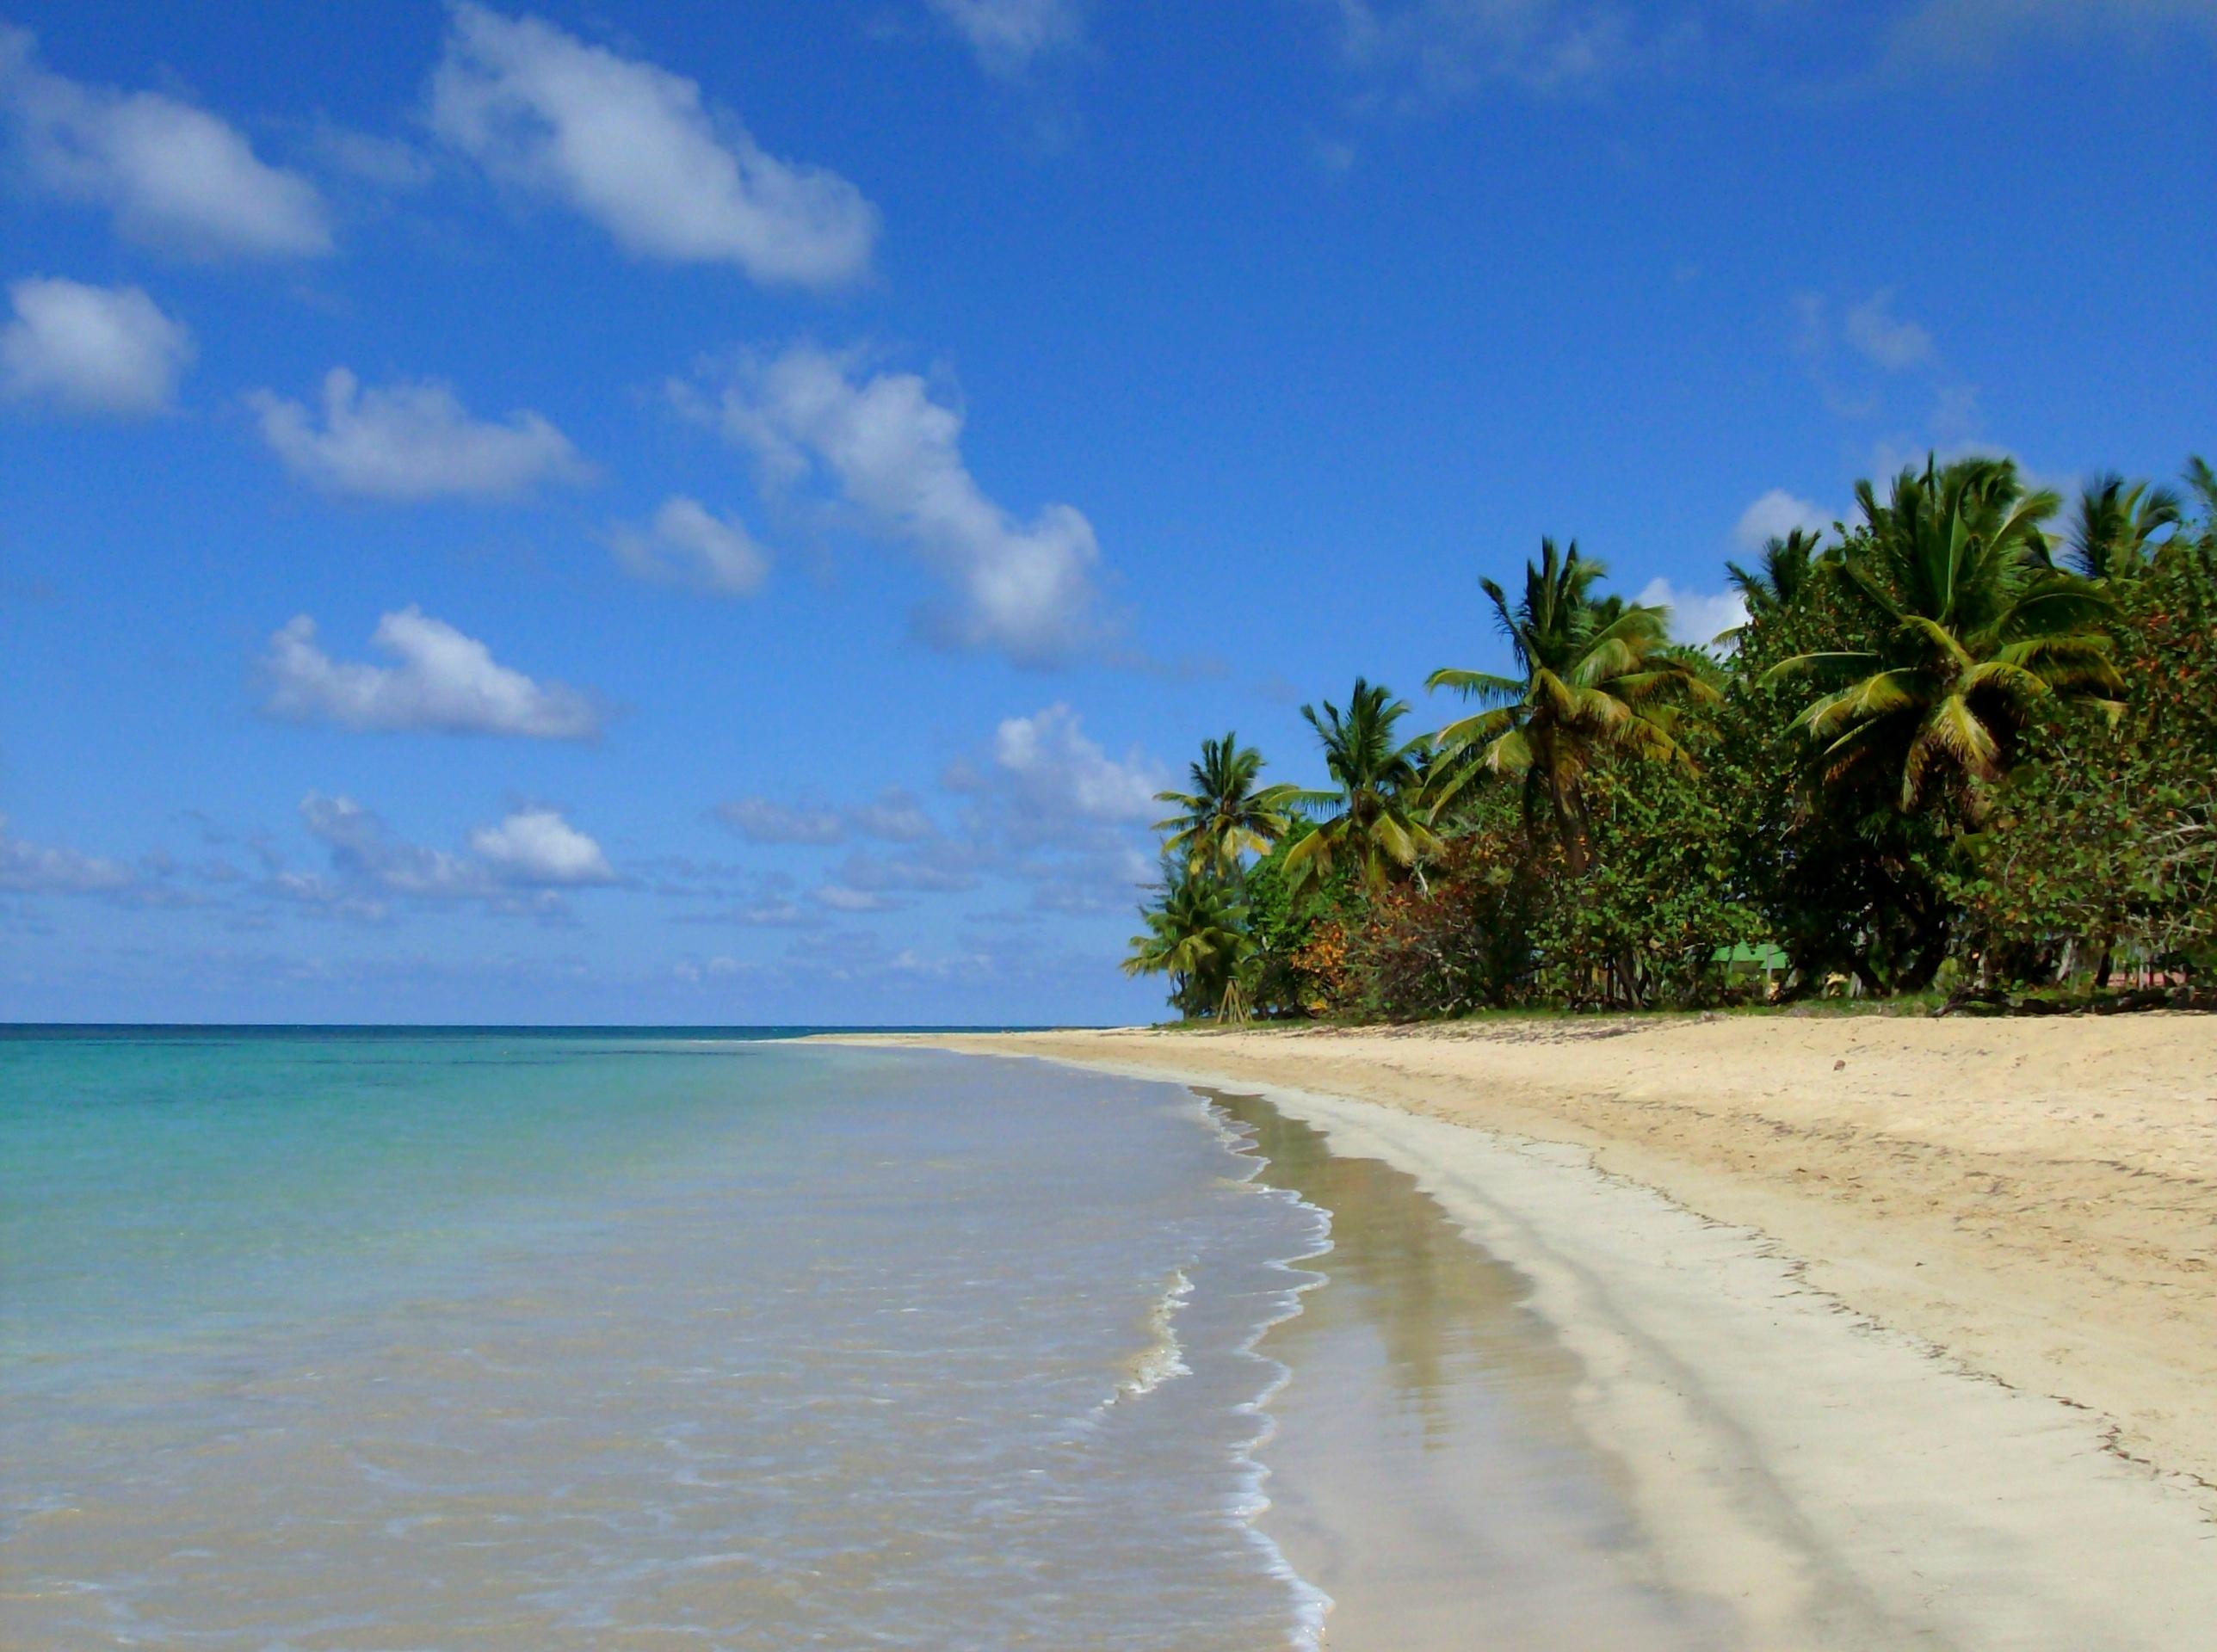 caribean beach 1 by Mittelfranke